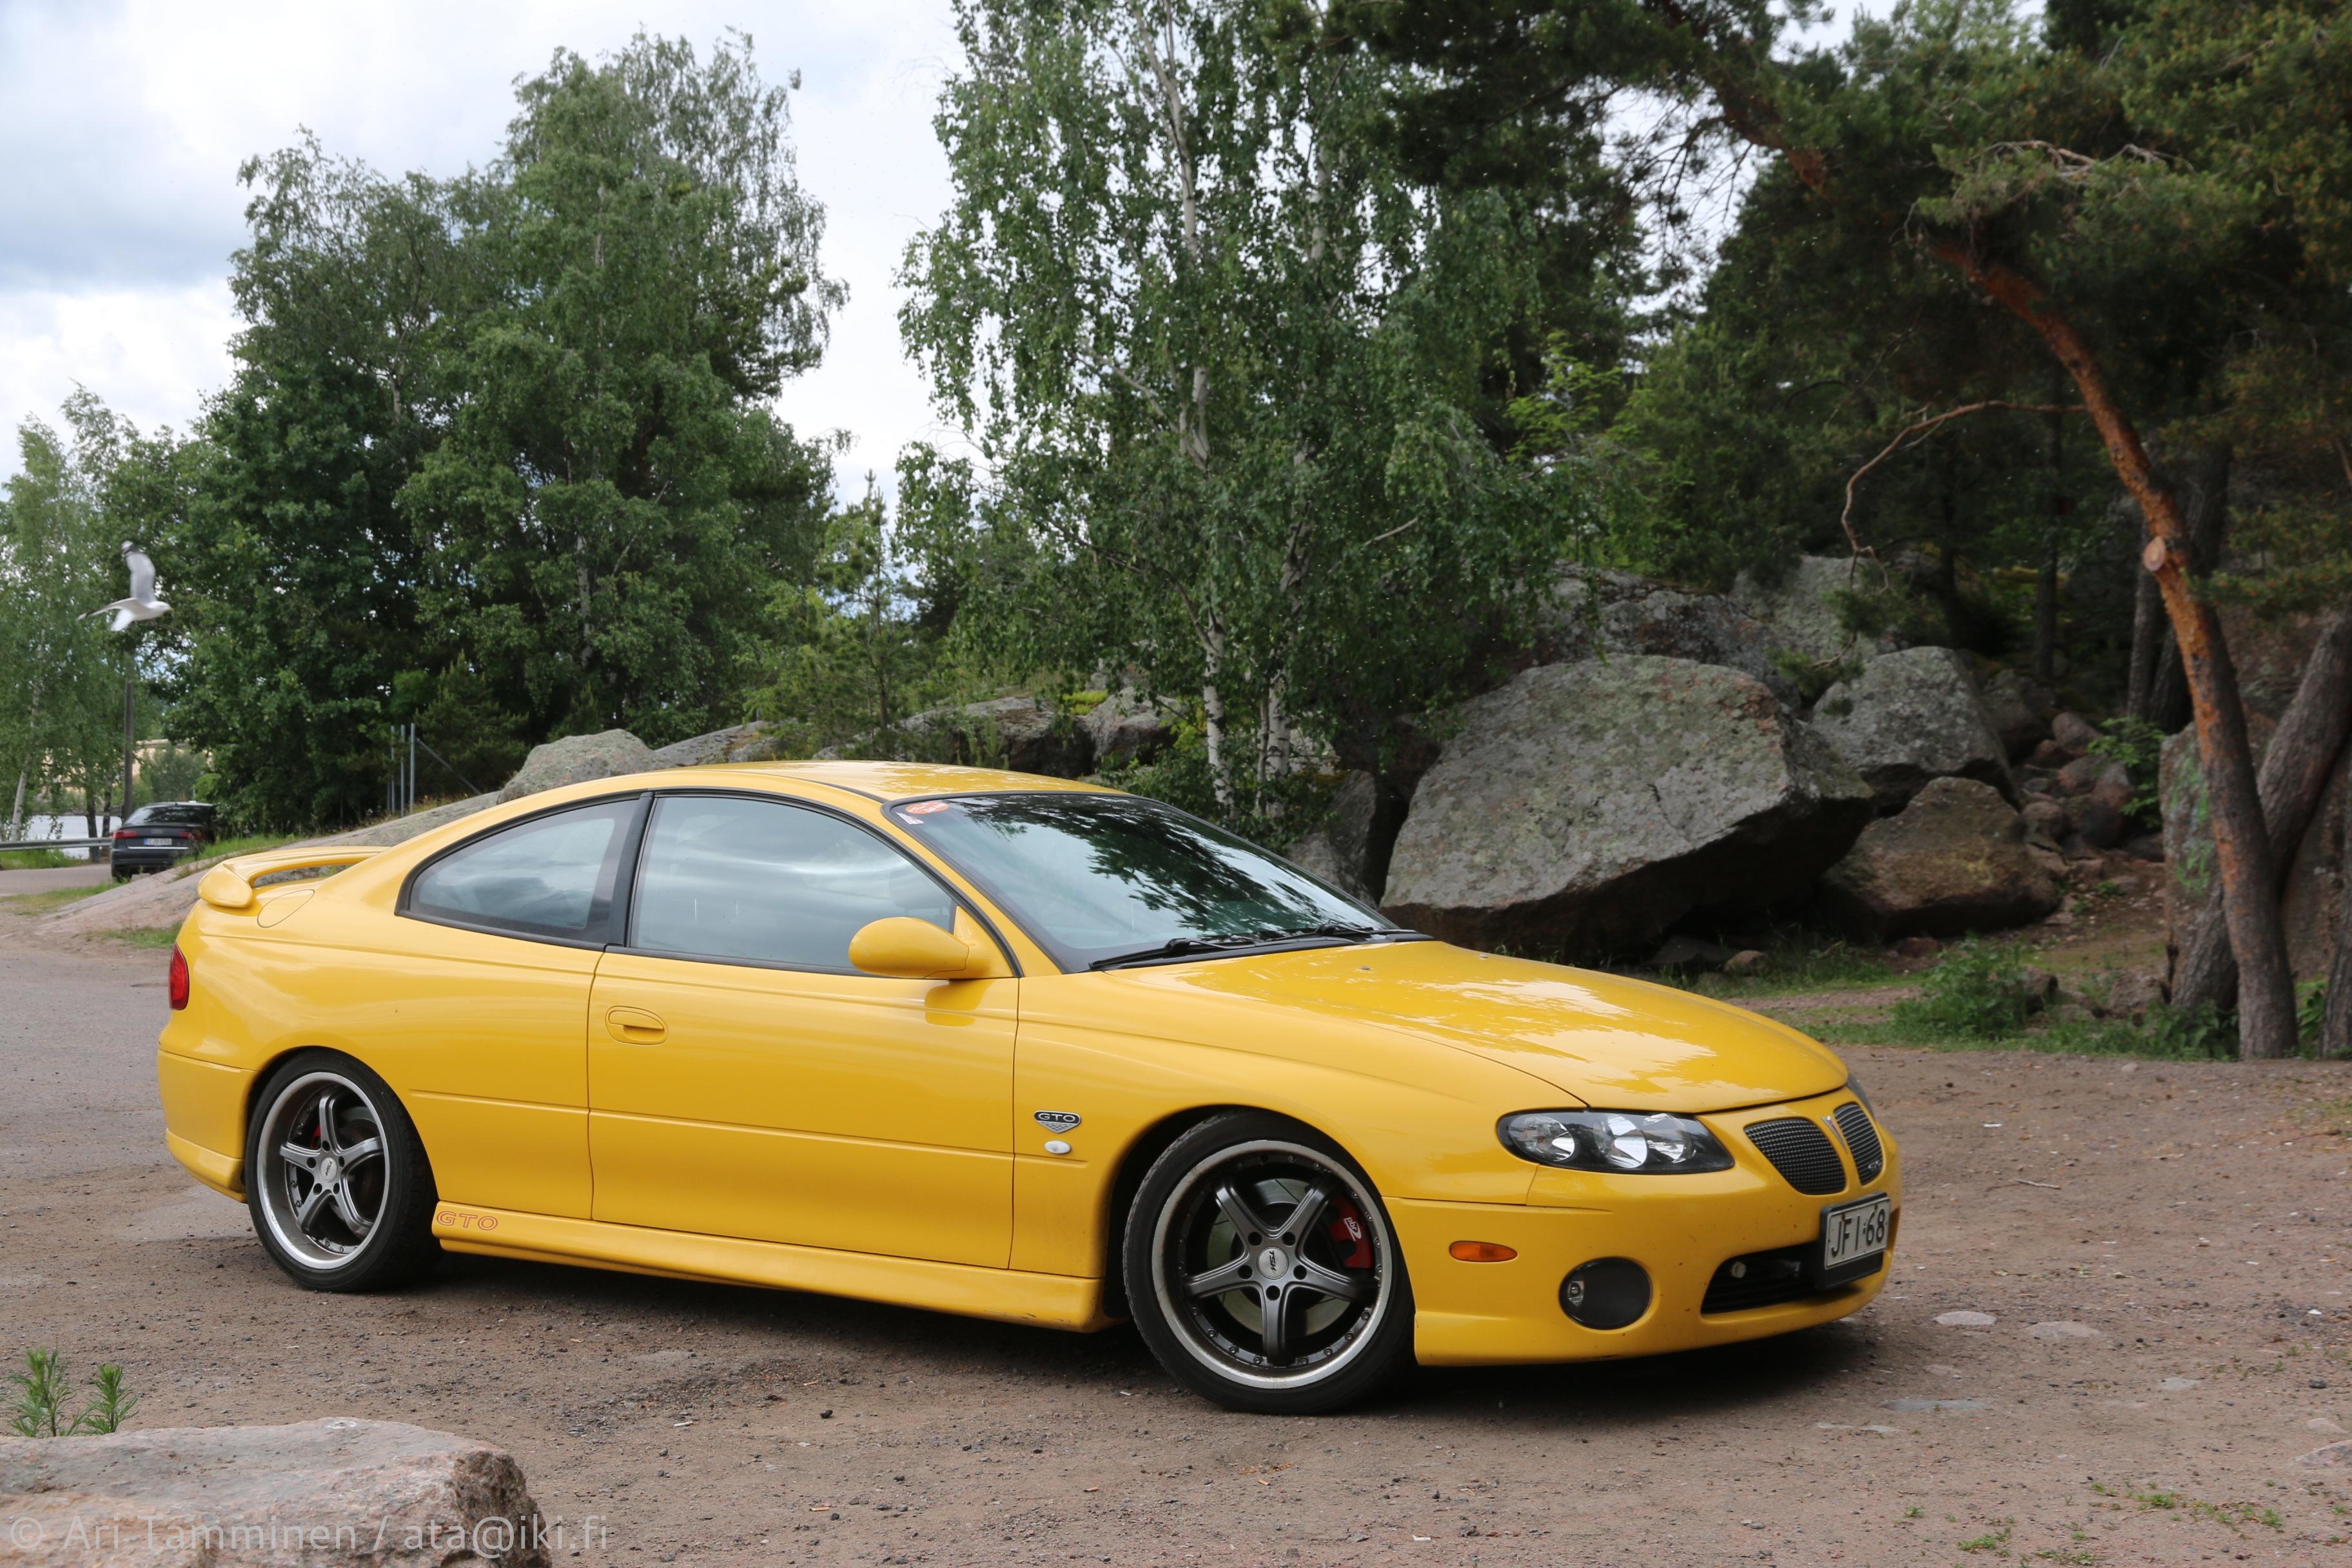 2004 Pontiac GTO 5.7 Coupe<br>346 cid LS1 + T56